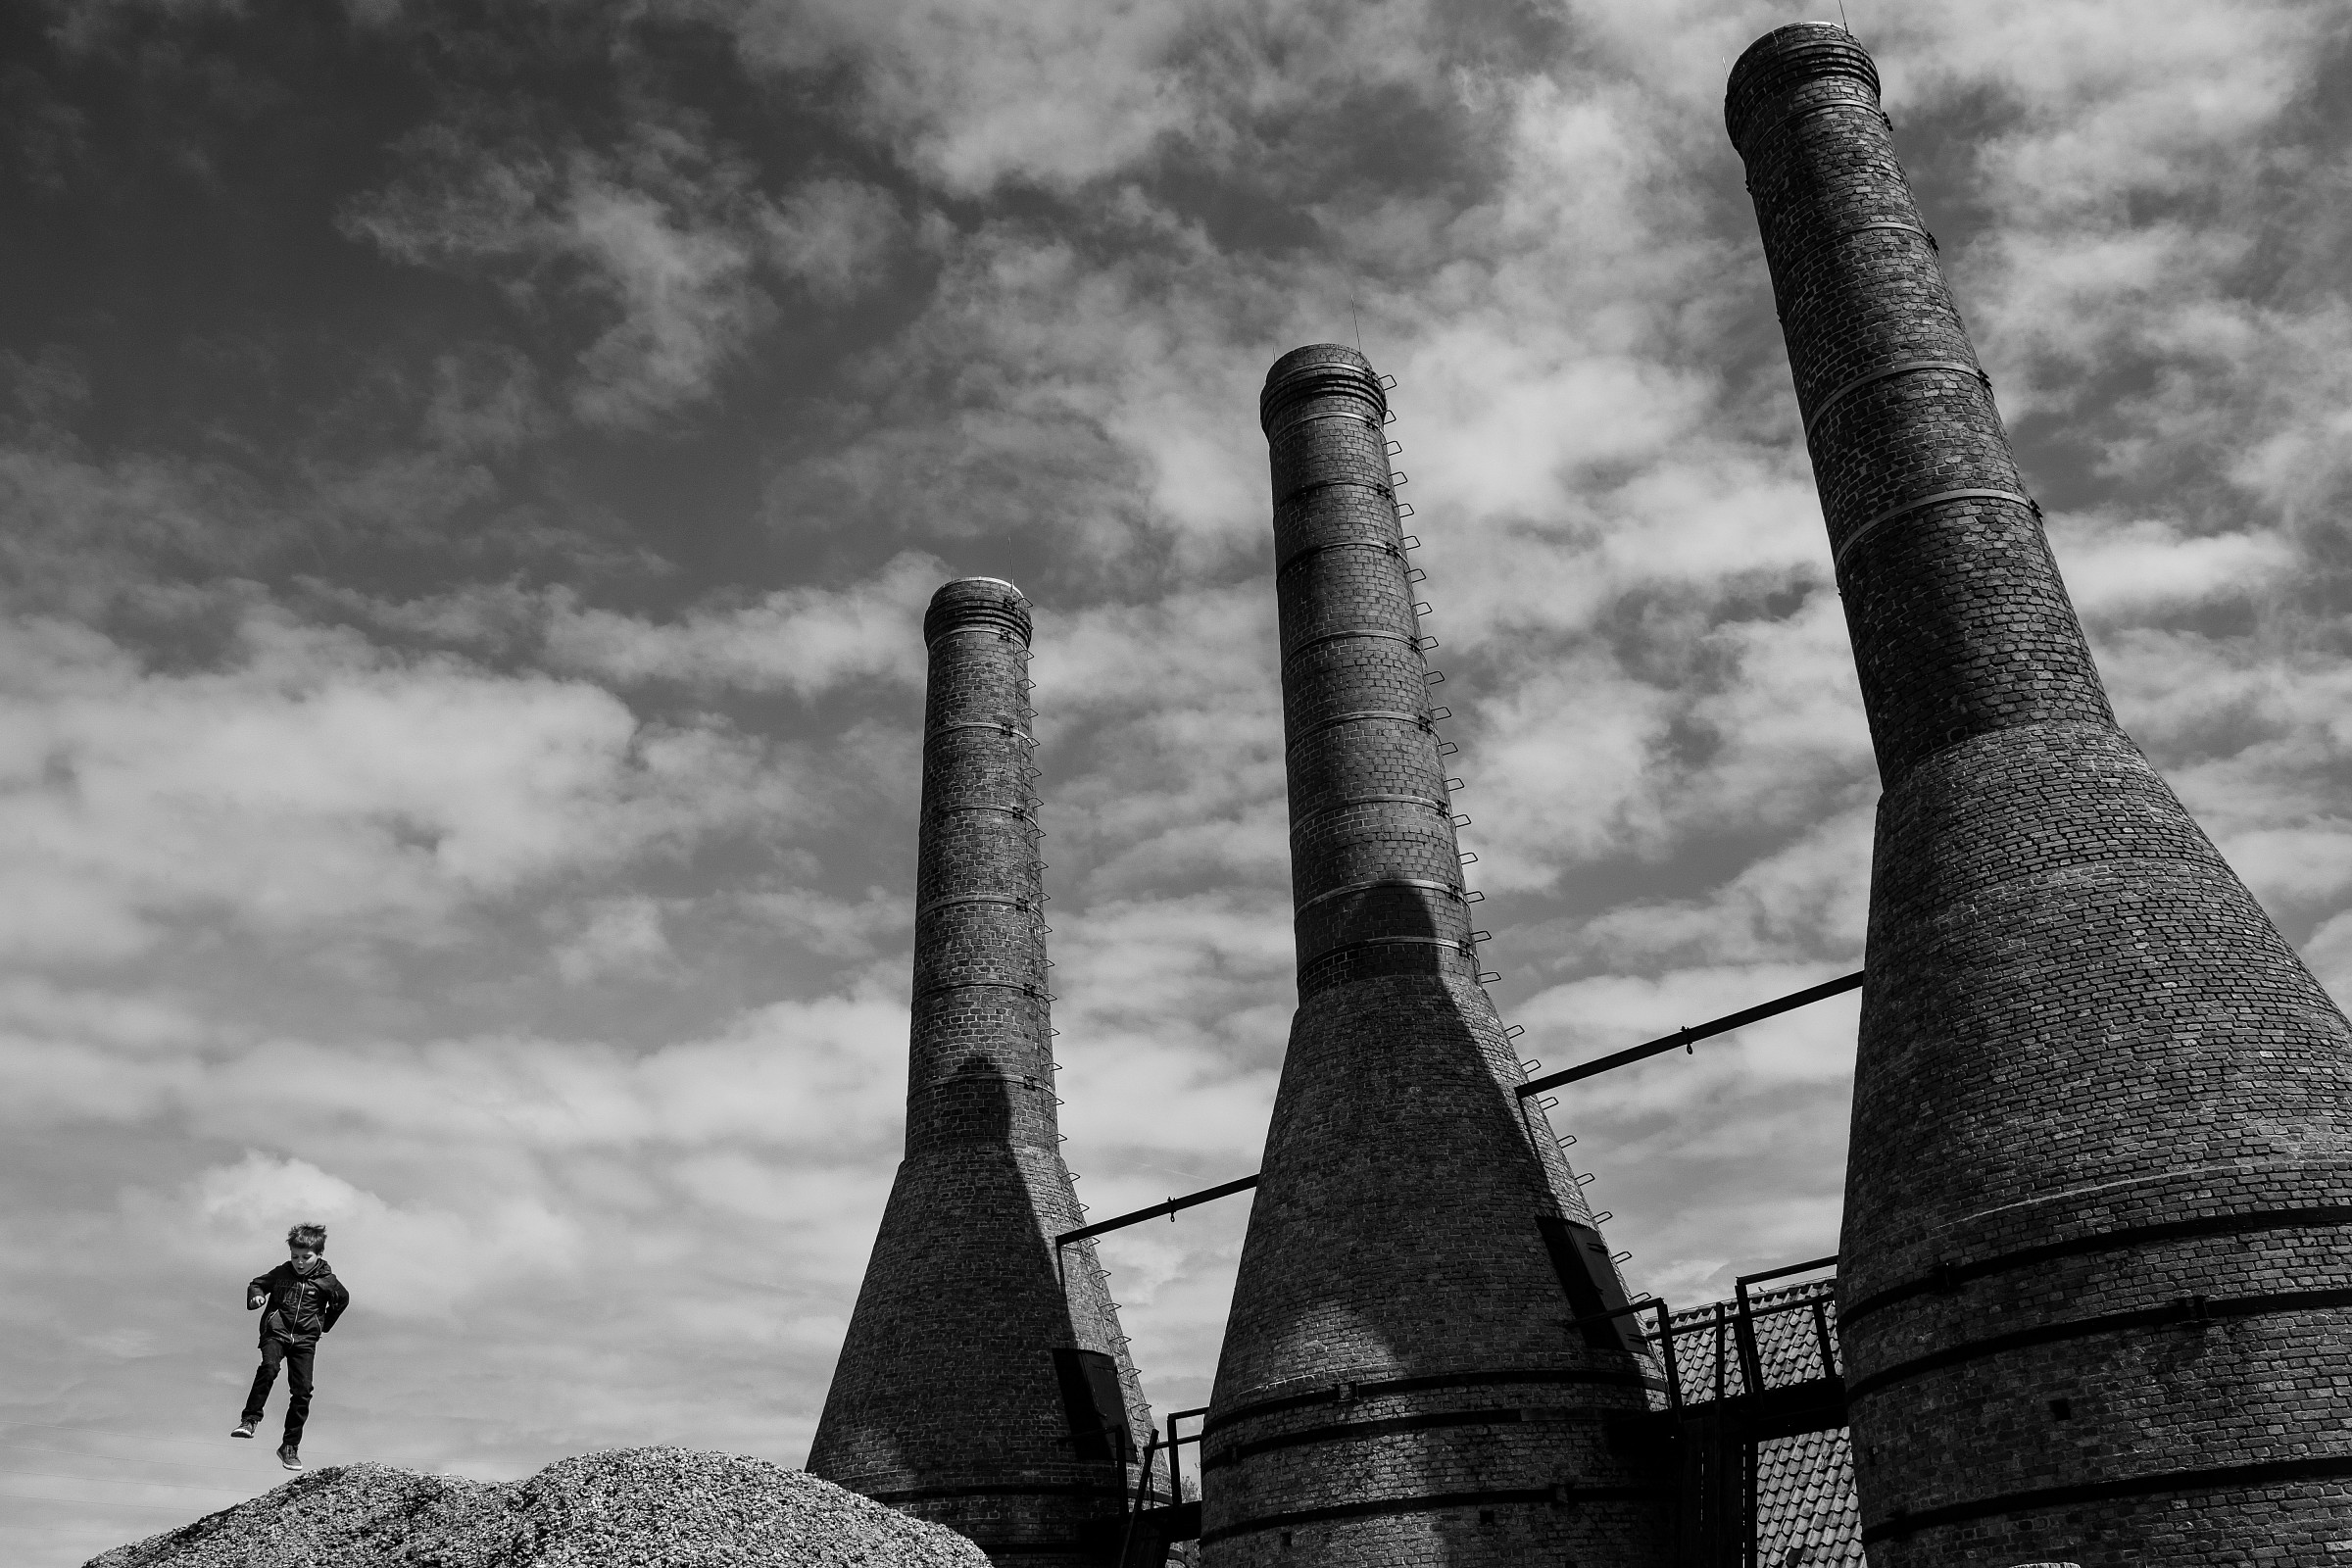 furnaces...